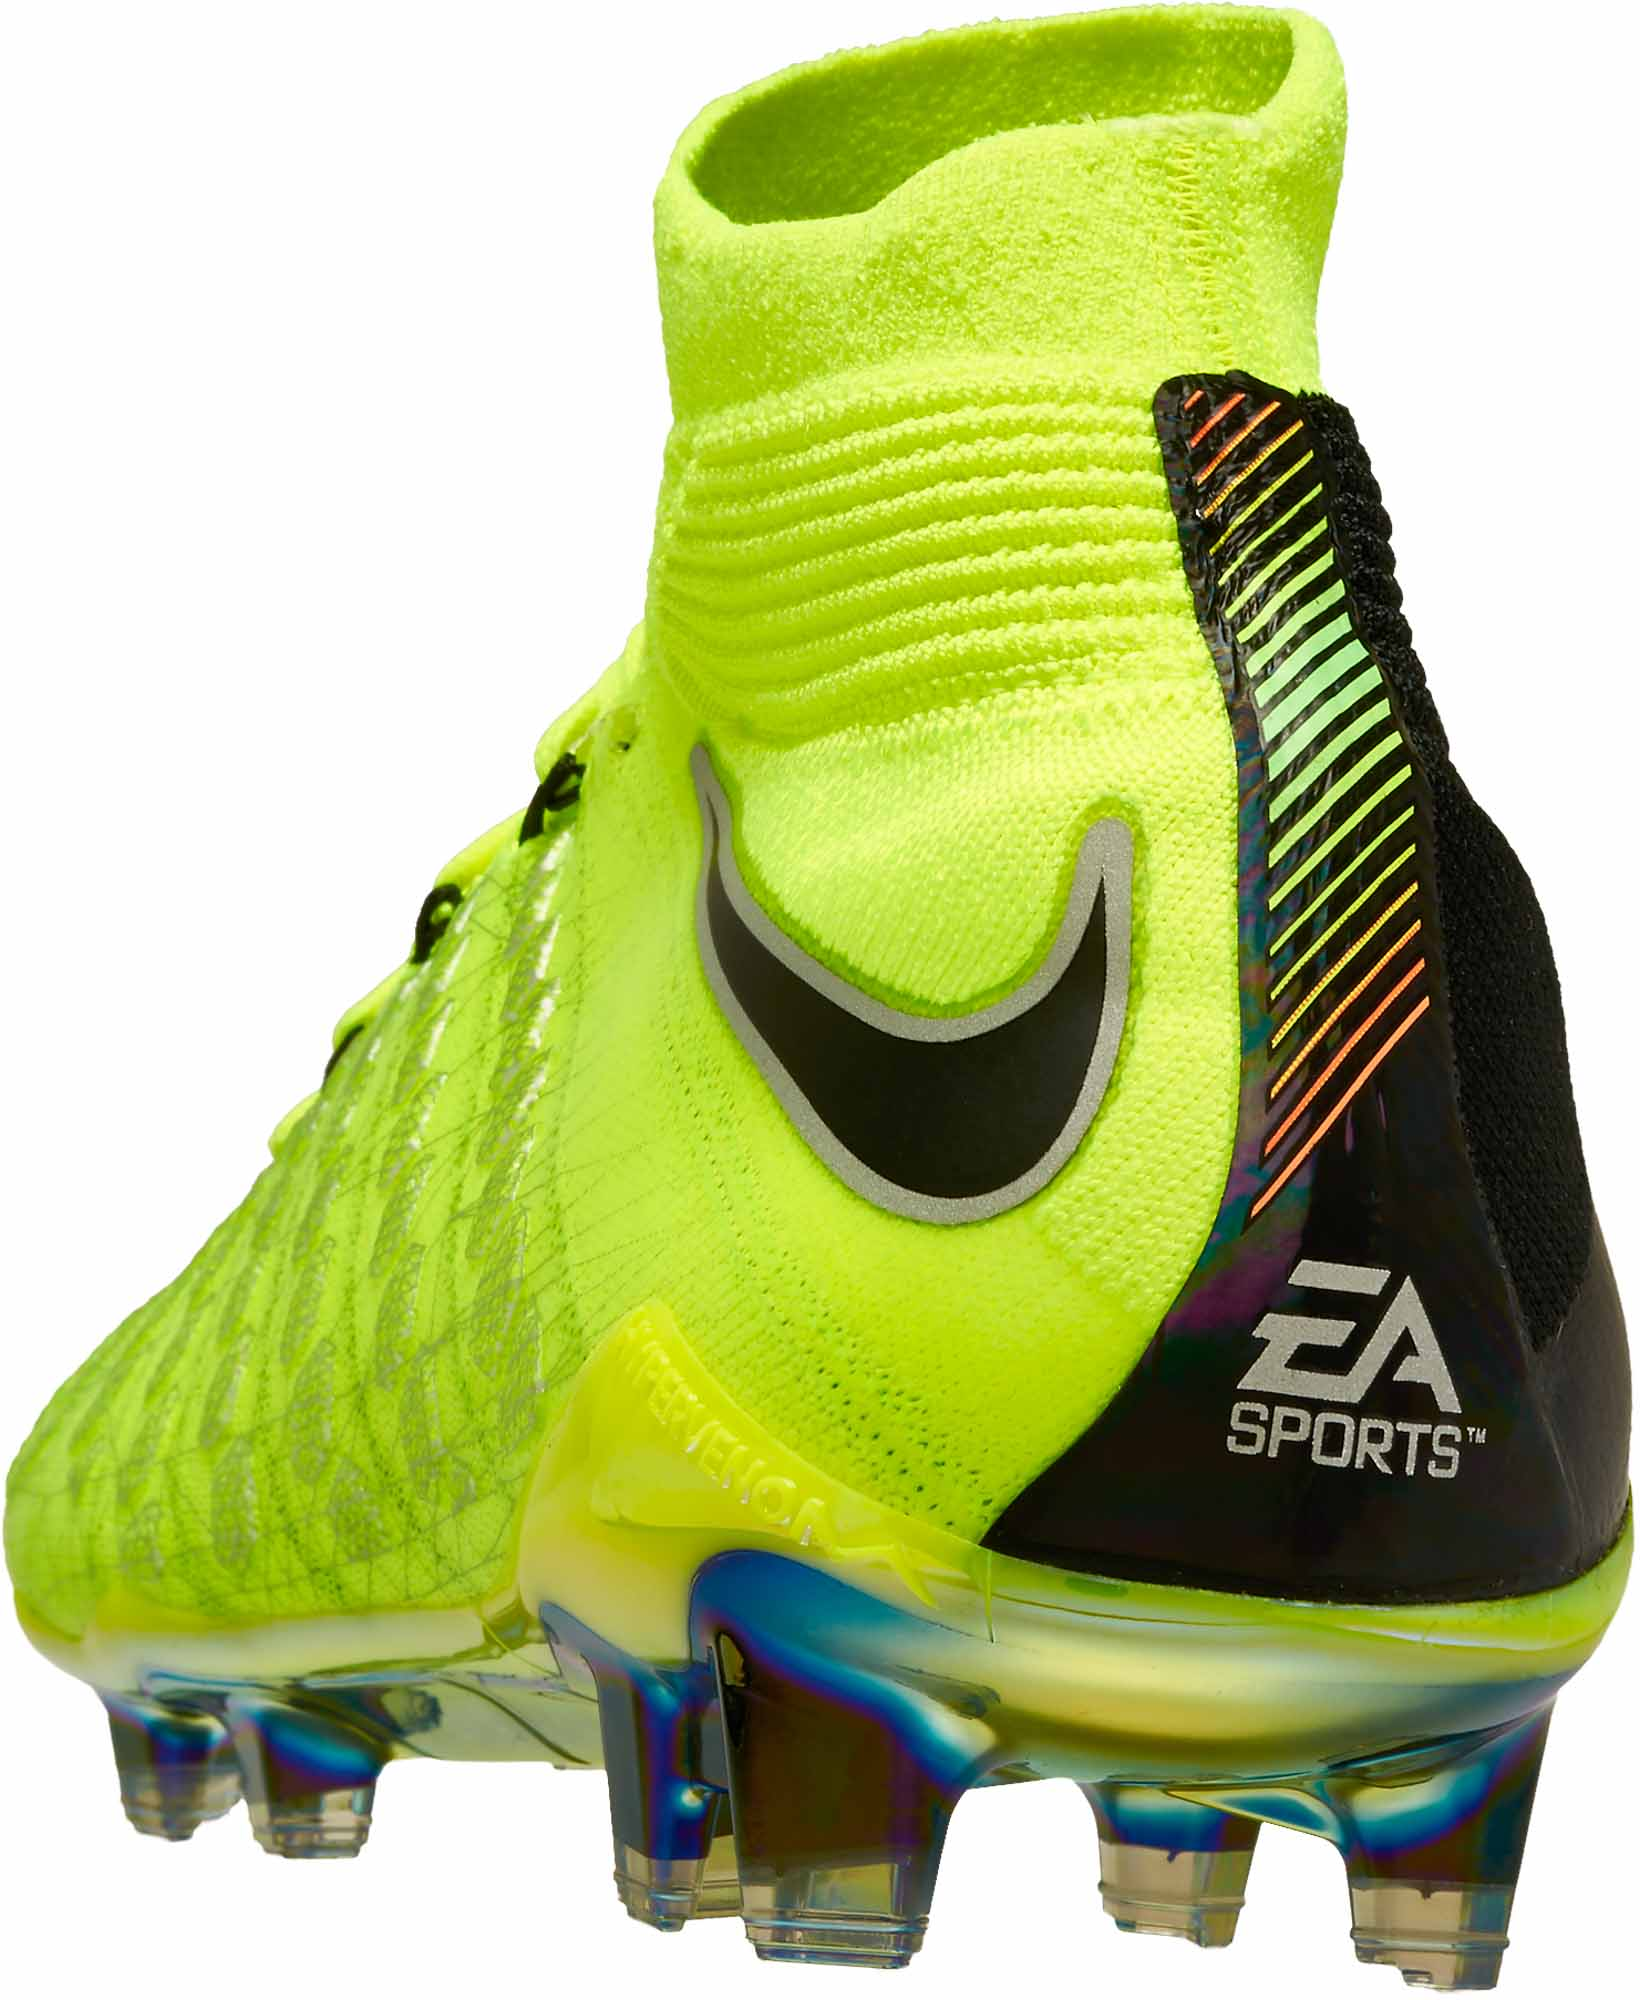 hot sale online 529e3 48106 Nike Kids Hypervenom Phantom III DF FG - EA Sports - Volt ...